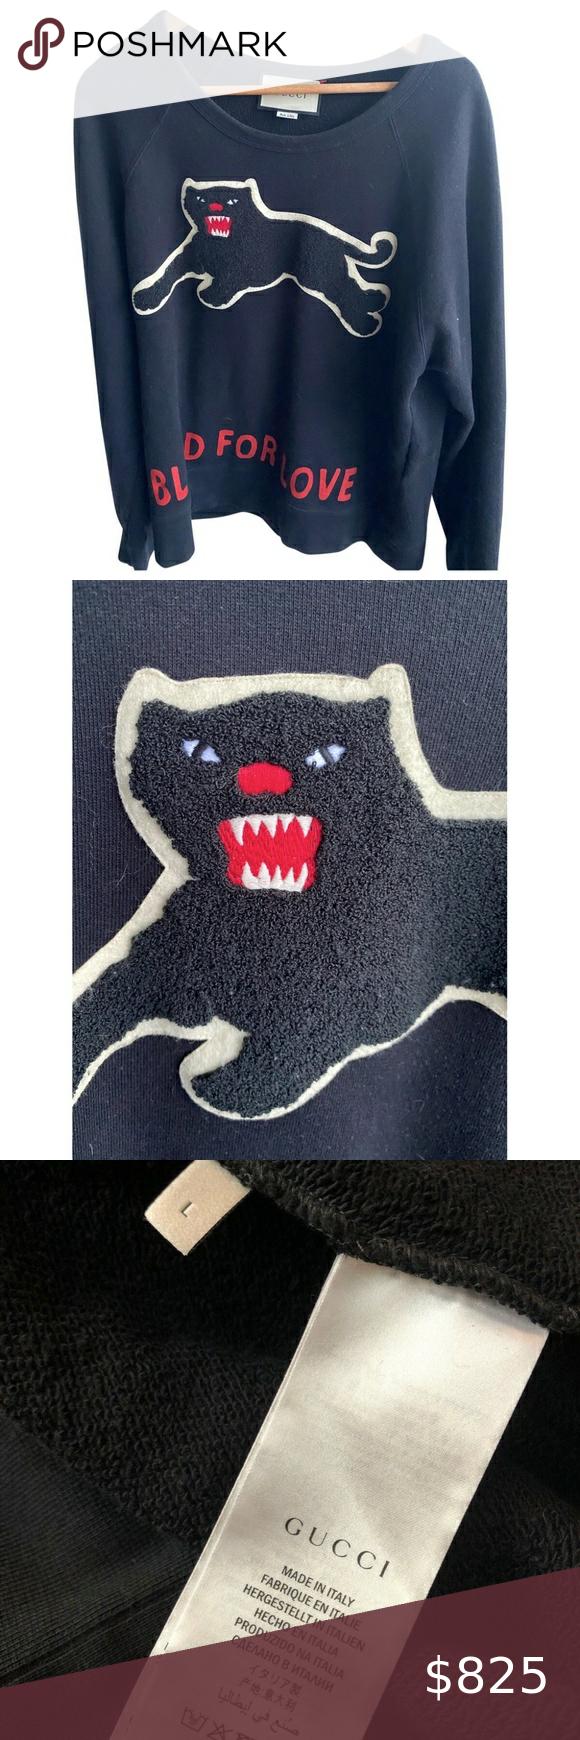 Gucci Black Panther Sweatshirt Sweater L Gucci Black Panther Sweatshirt Sweater L Gucci Sweaters Crewneck Gucci Black Sweatshirt Sweater Sweatshirts [ 1740 x 580 Pixel ]